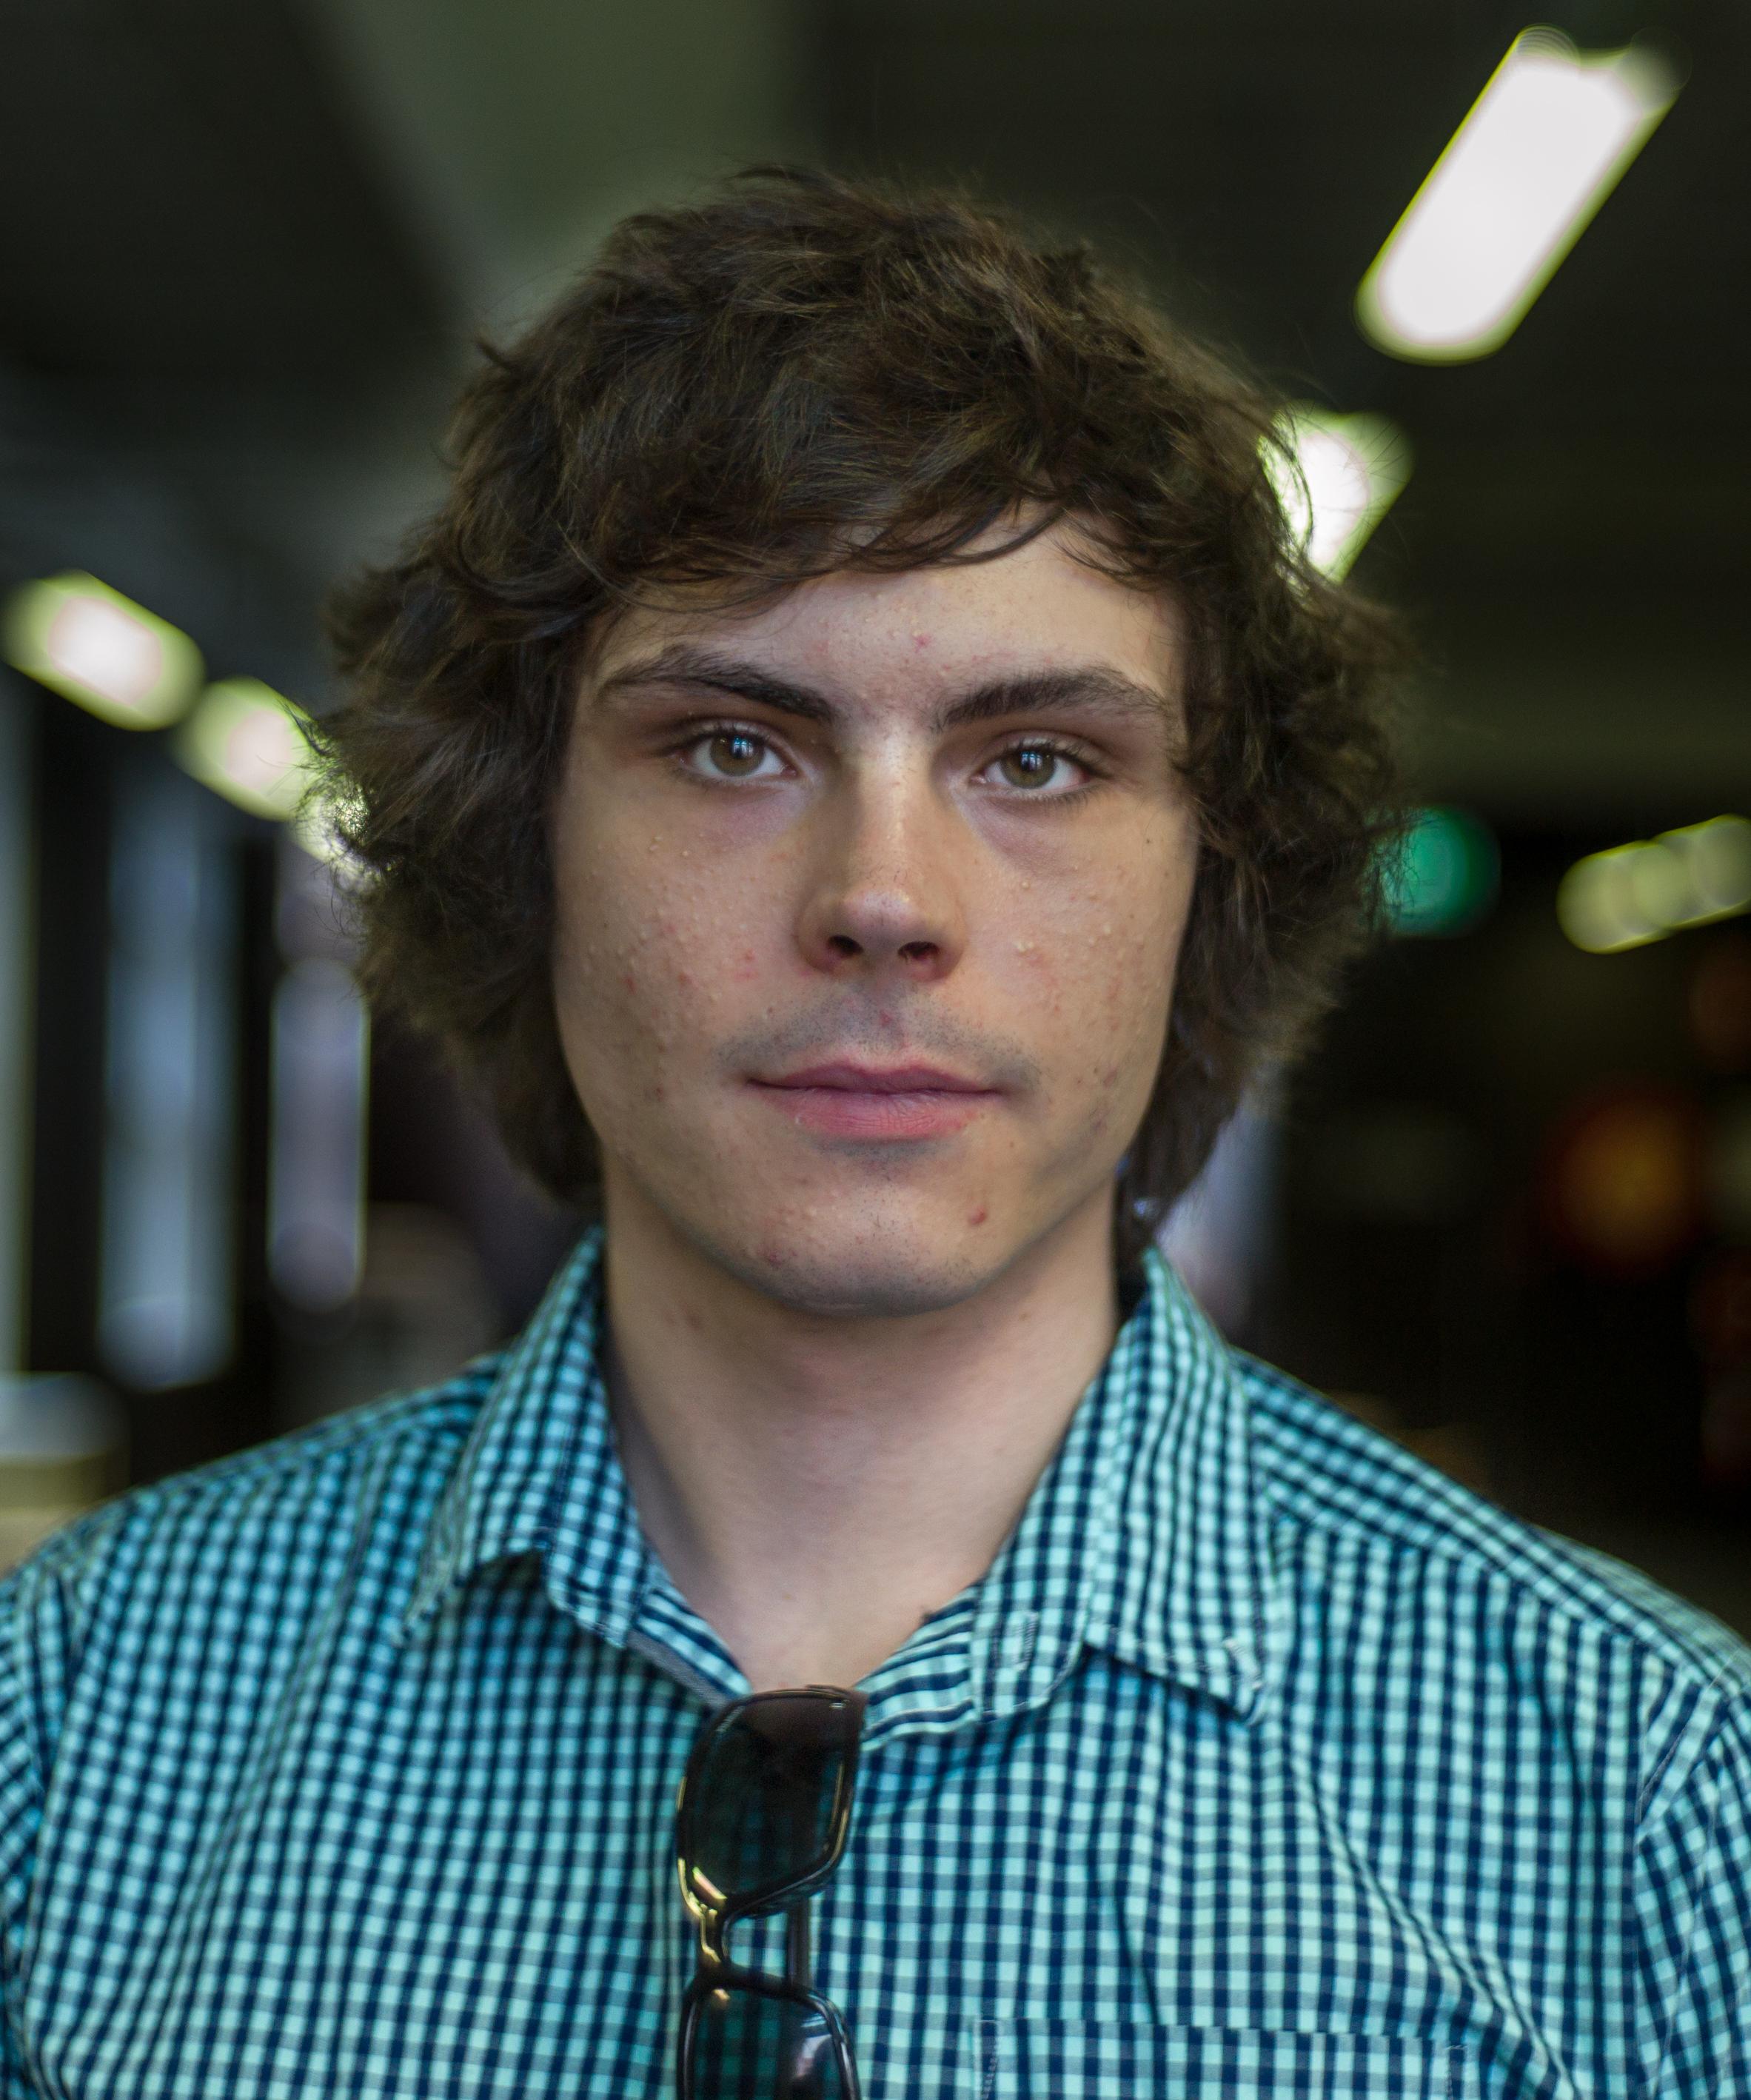 Nathan - Team 1